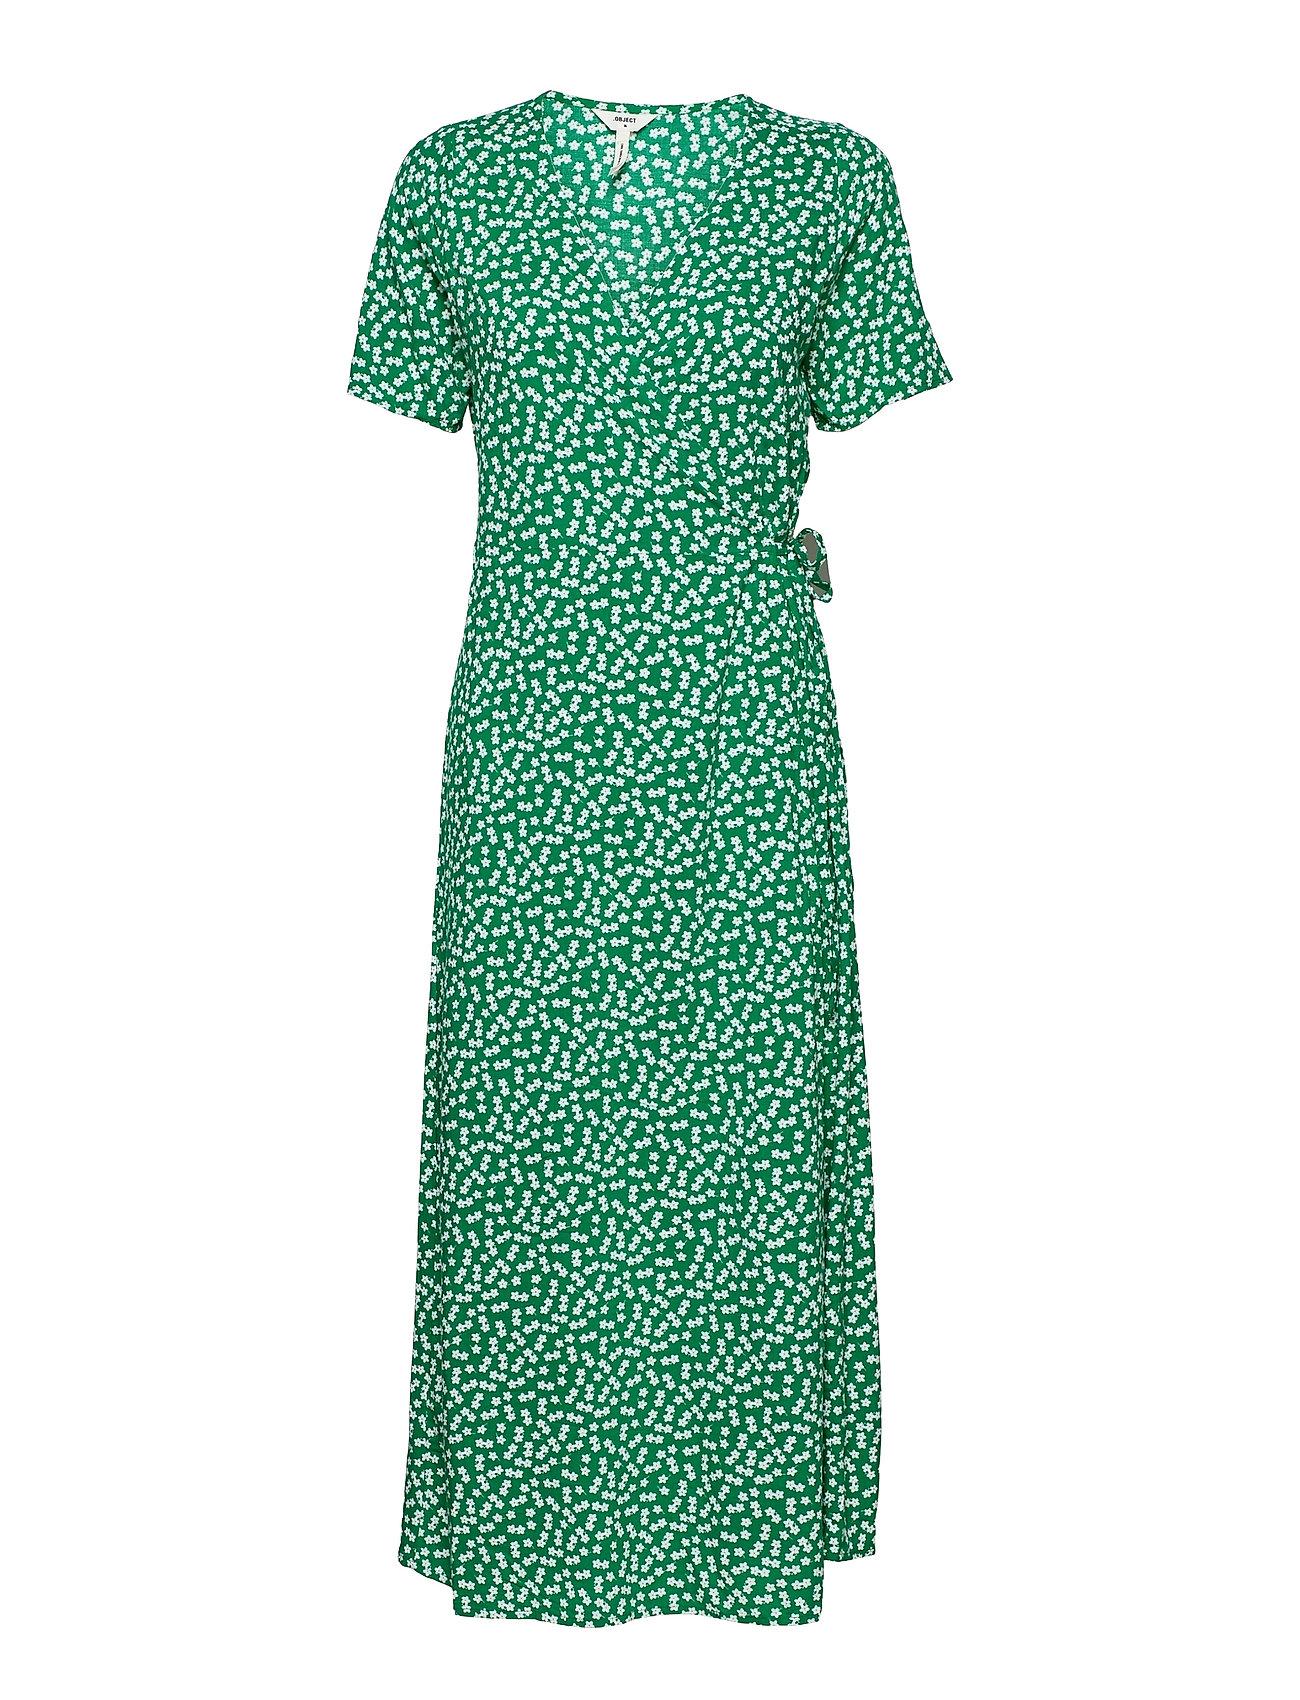 Objelise S/S Long Wrap Dress A Div Dresses Wrap Dresses Grøn Object